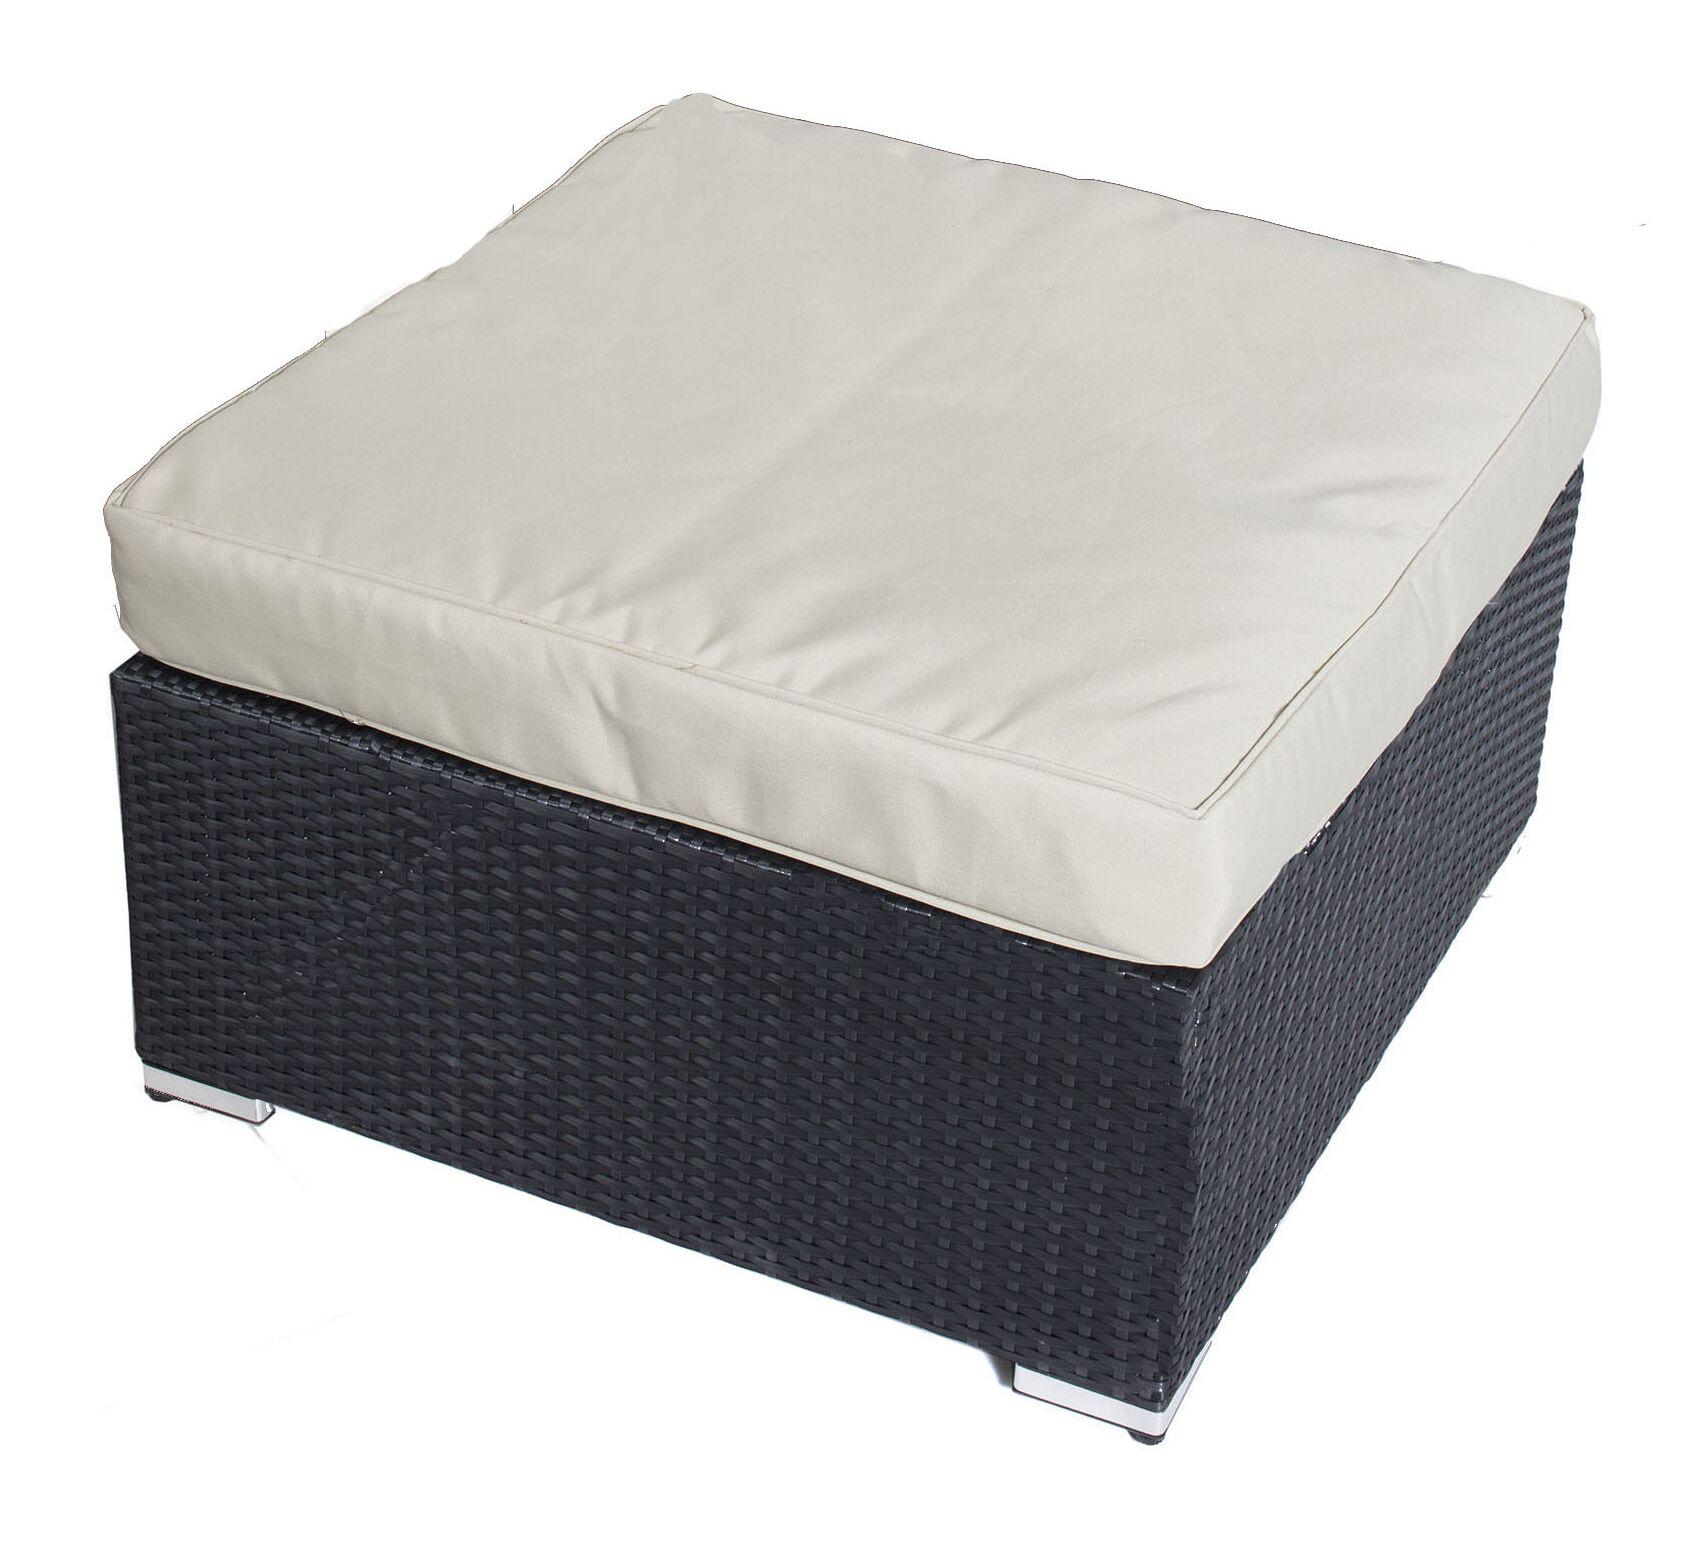 Kingsdown Ottoman with Cushion Fabric: Taupe